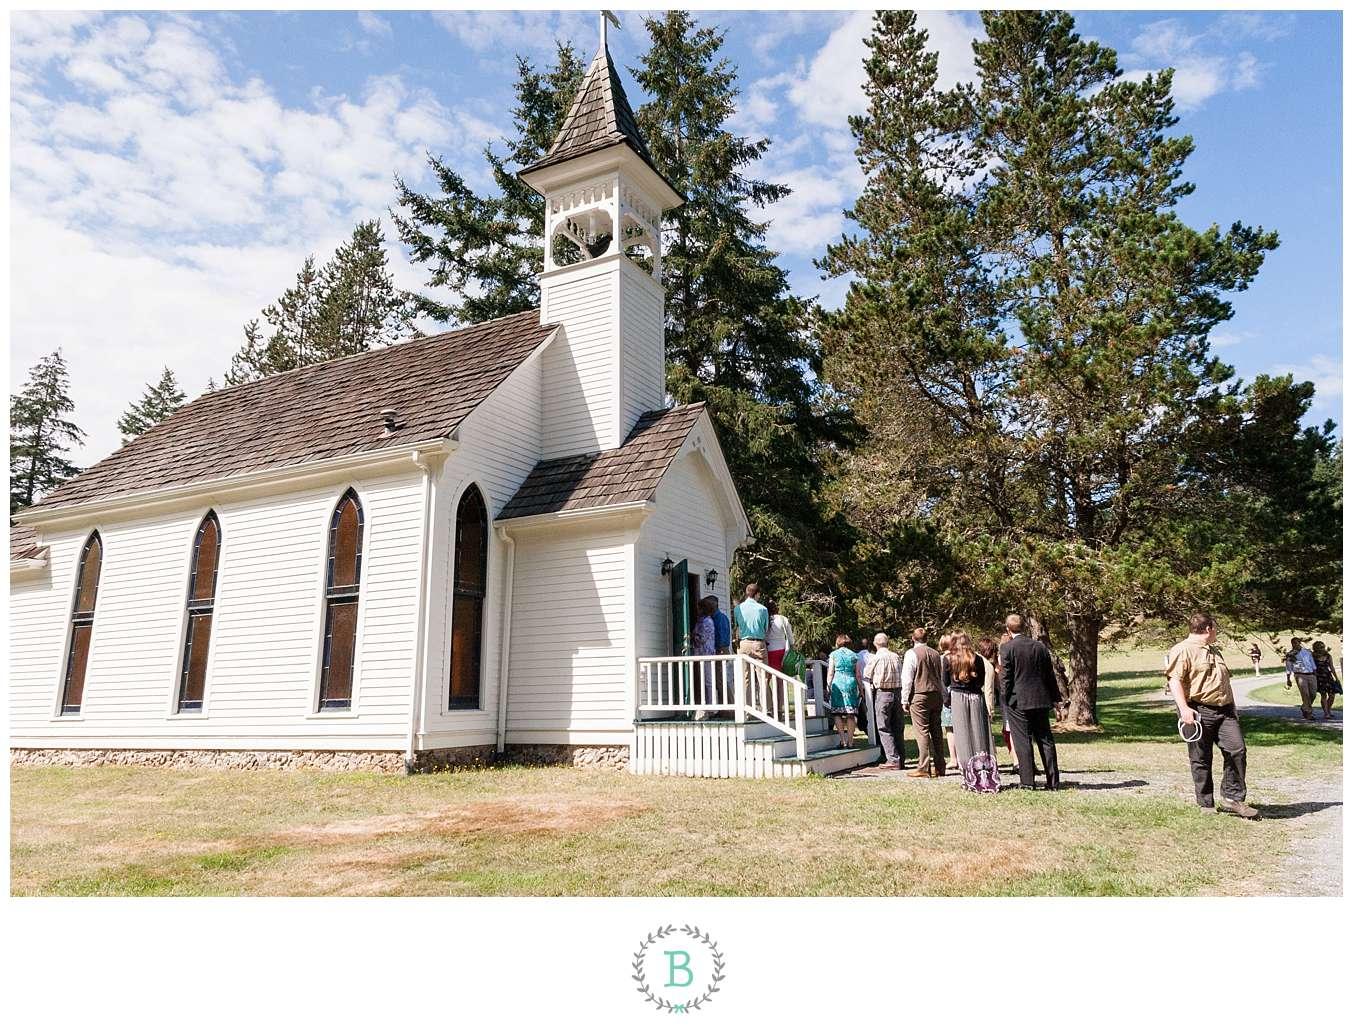 B-Jones-Photography-Seattle-Wedding-Photographer_0792.jpg